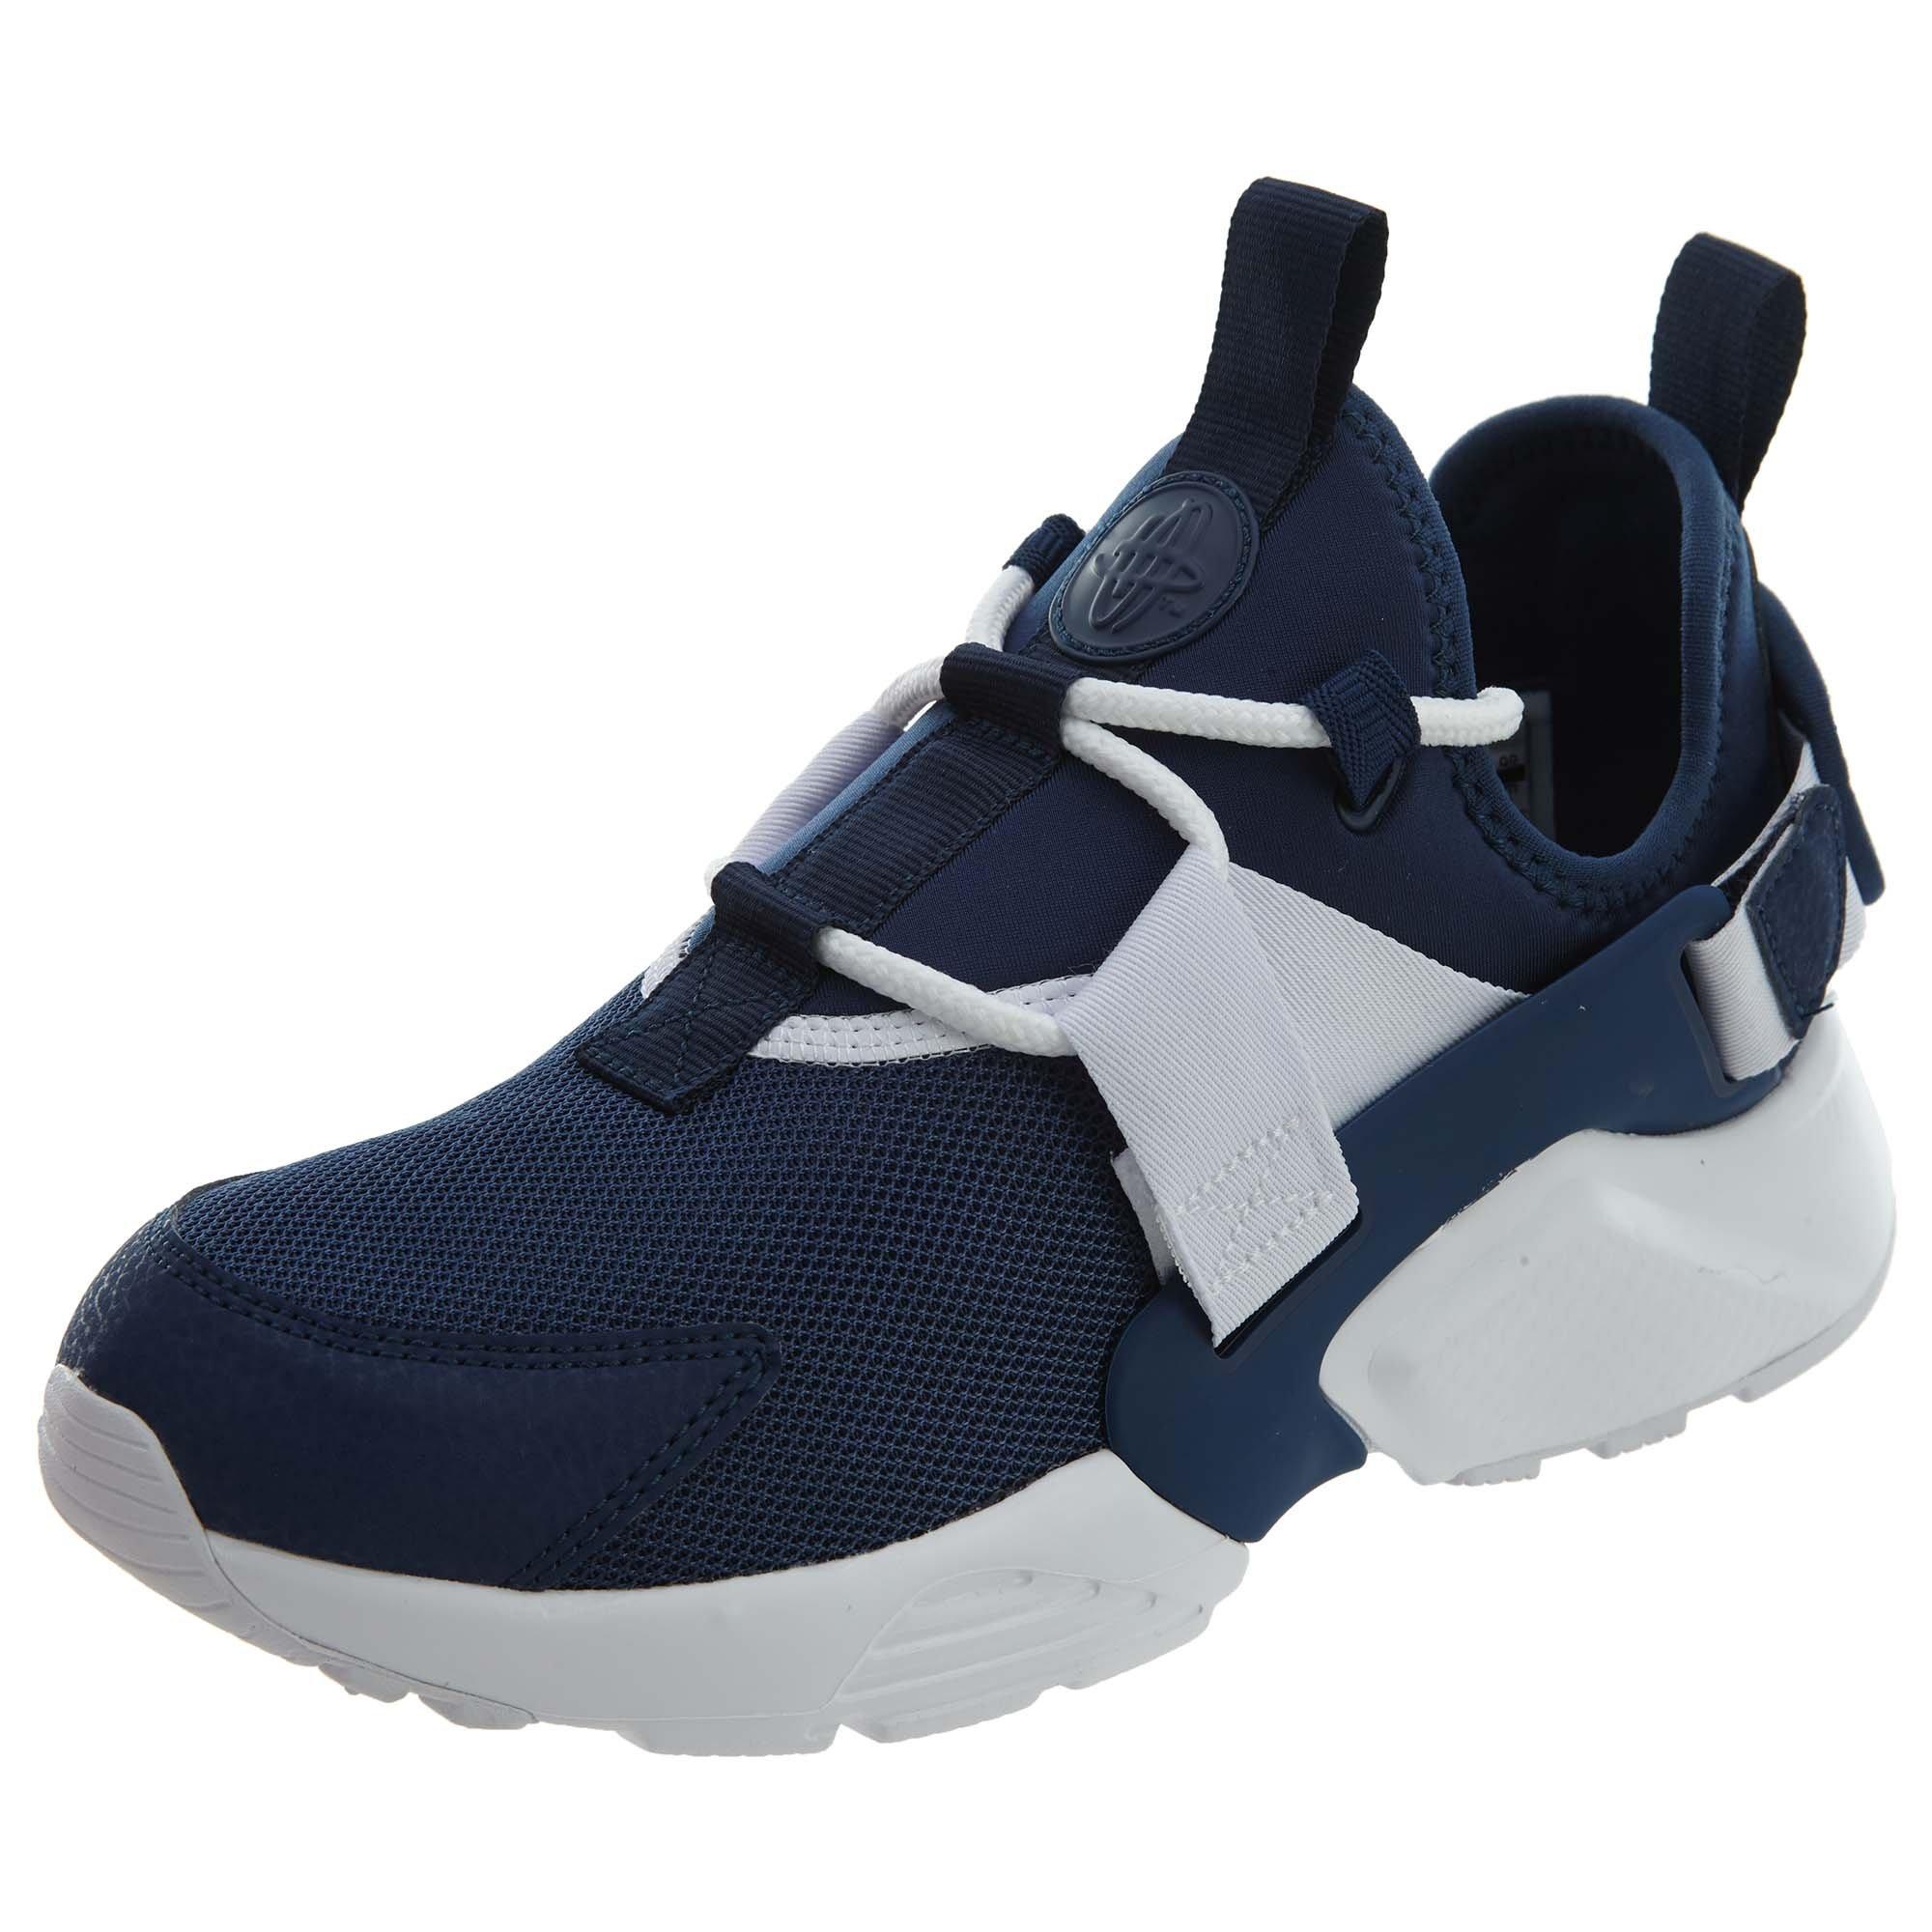 38f71135d626b Galleon - Nike Air Huarache City Low Navy White Womens Style: AH6804-400  Size: 7